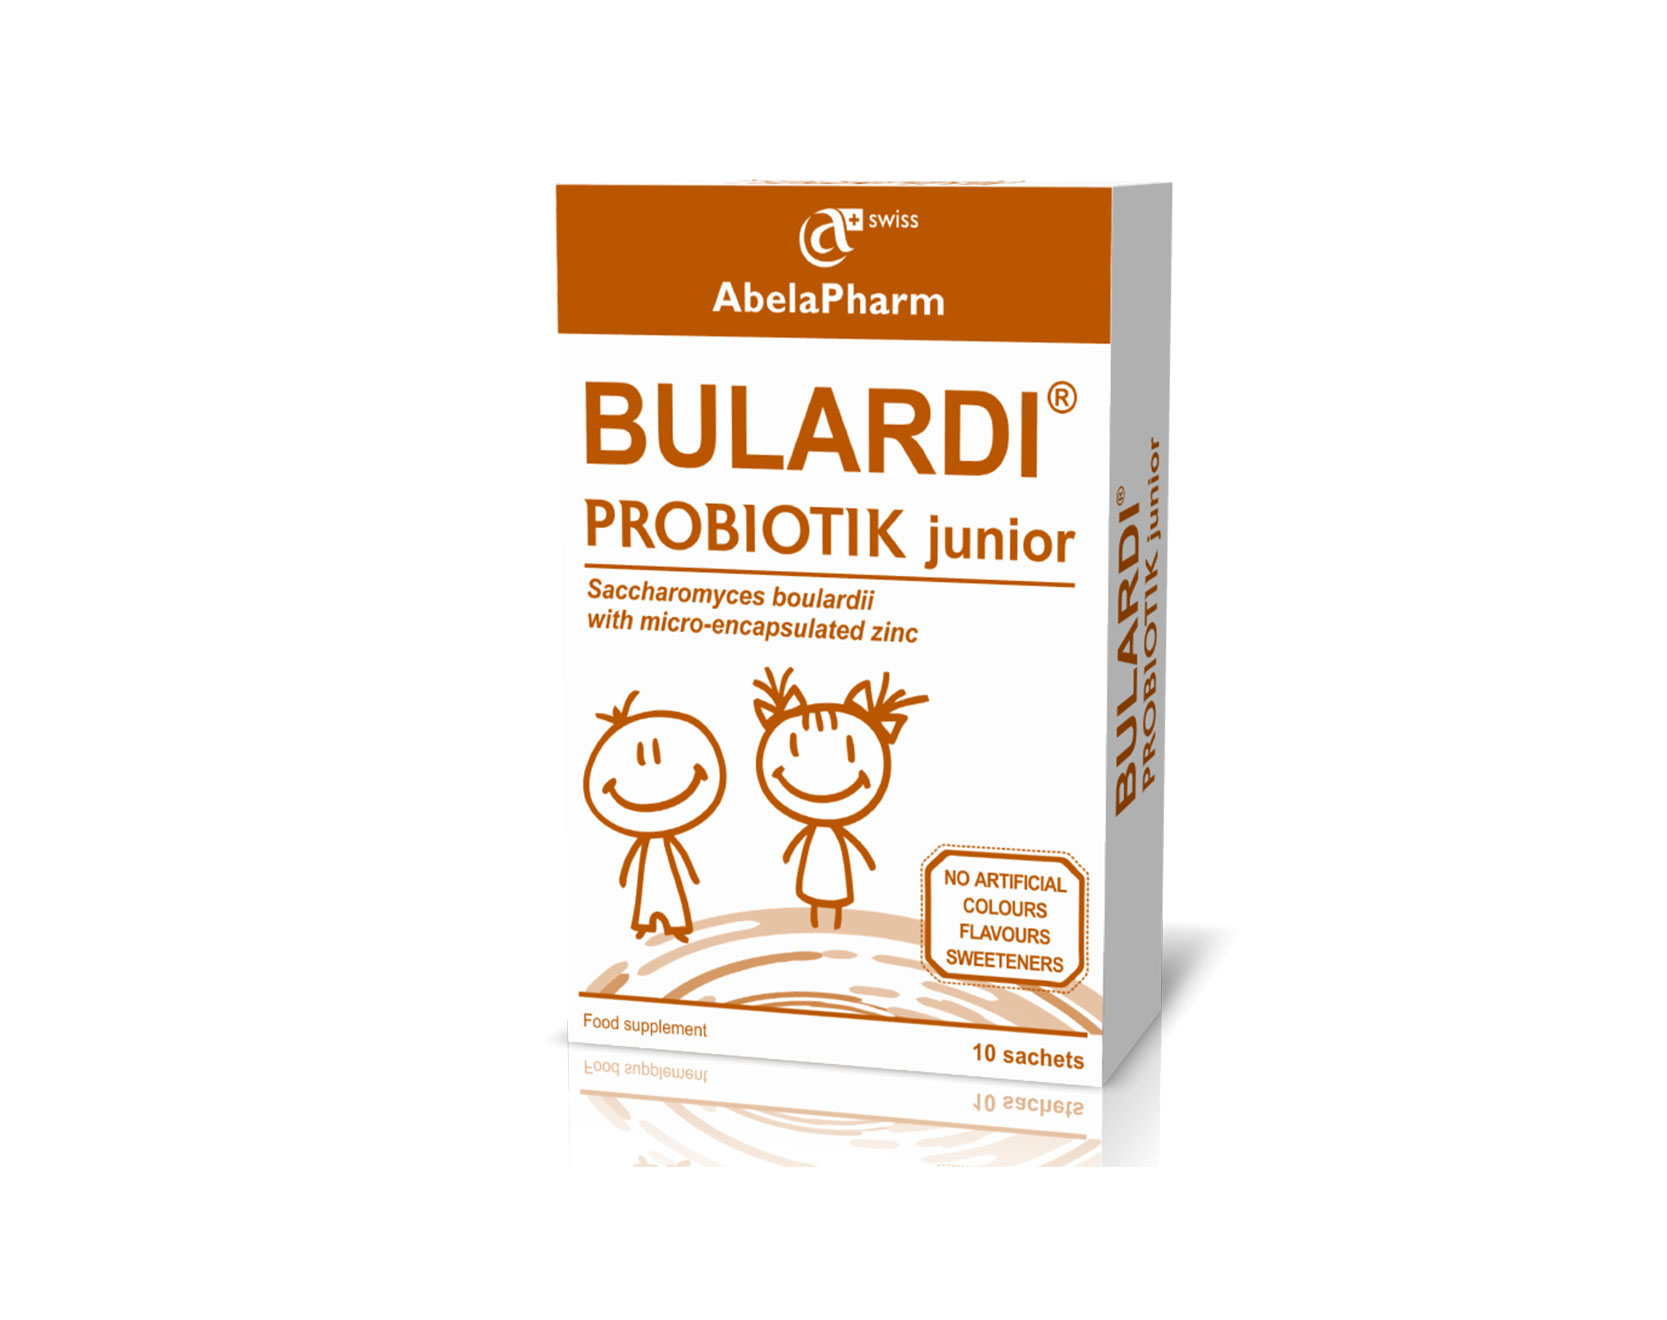 Bulardi probiotic Sachets Junior